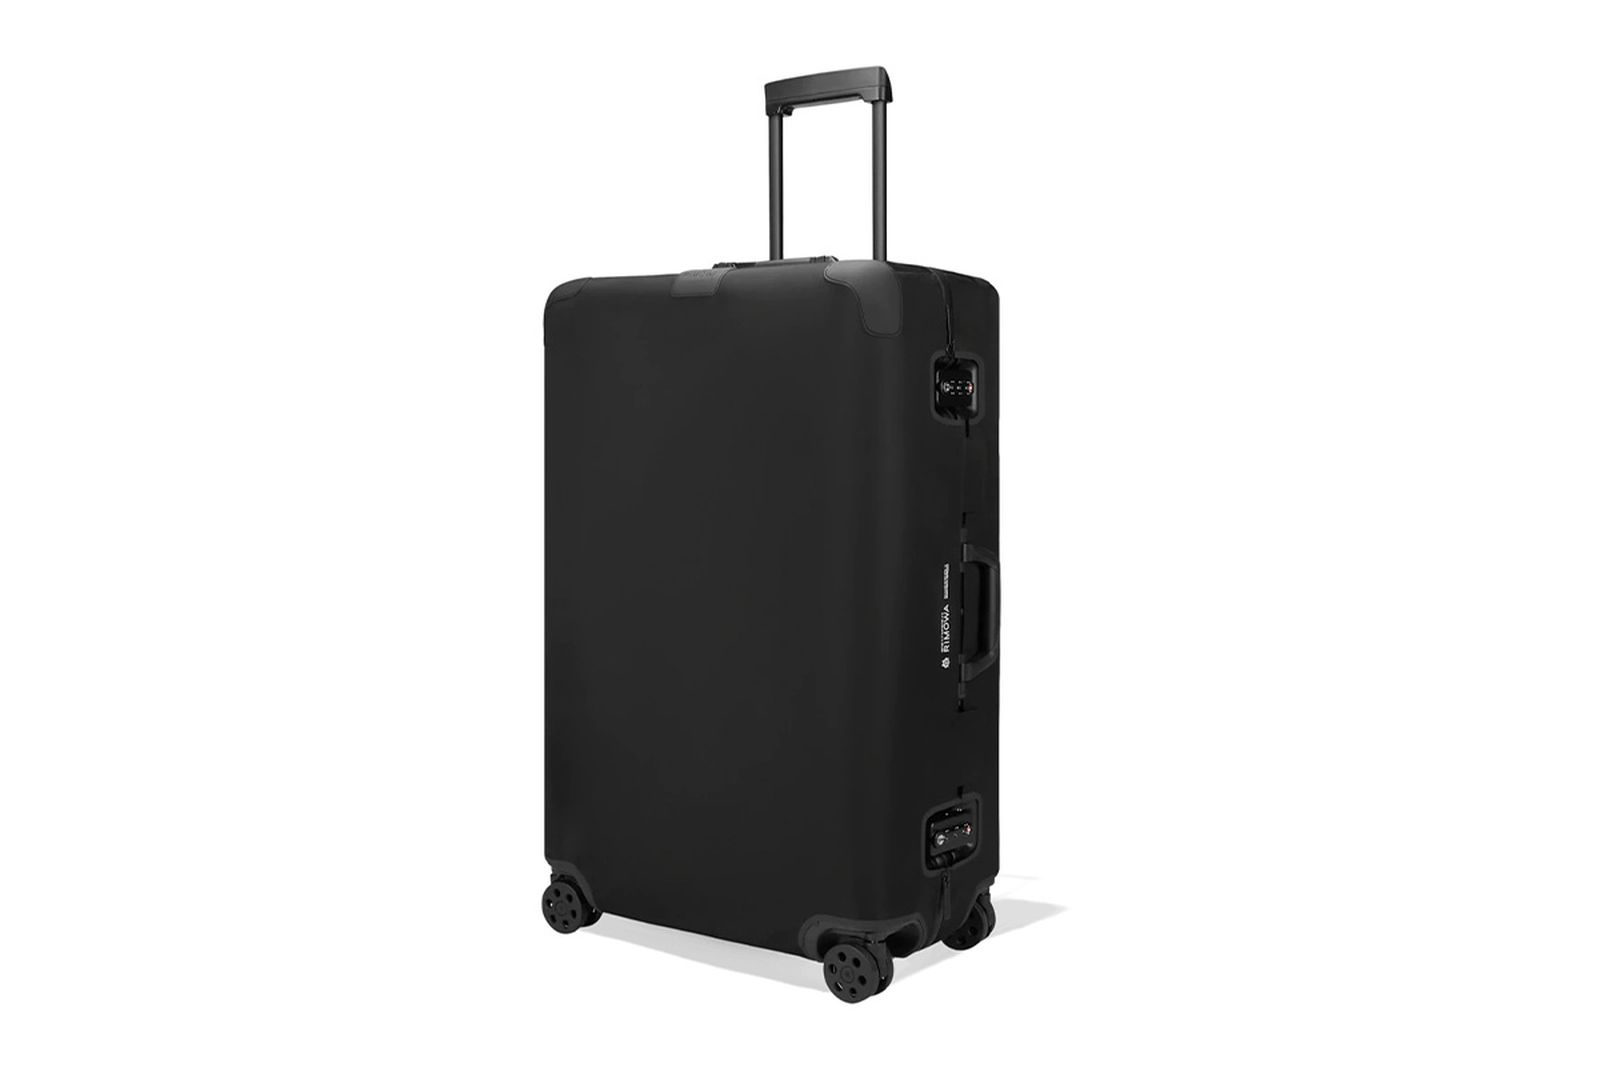 rimowa-luggage-suitcase-cover-03